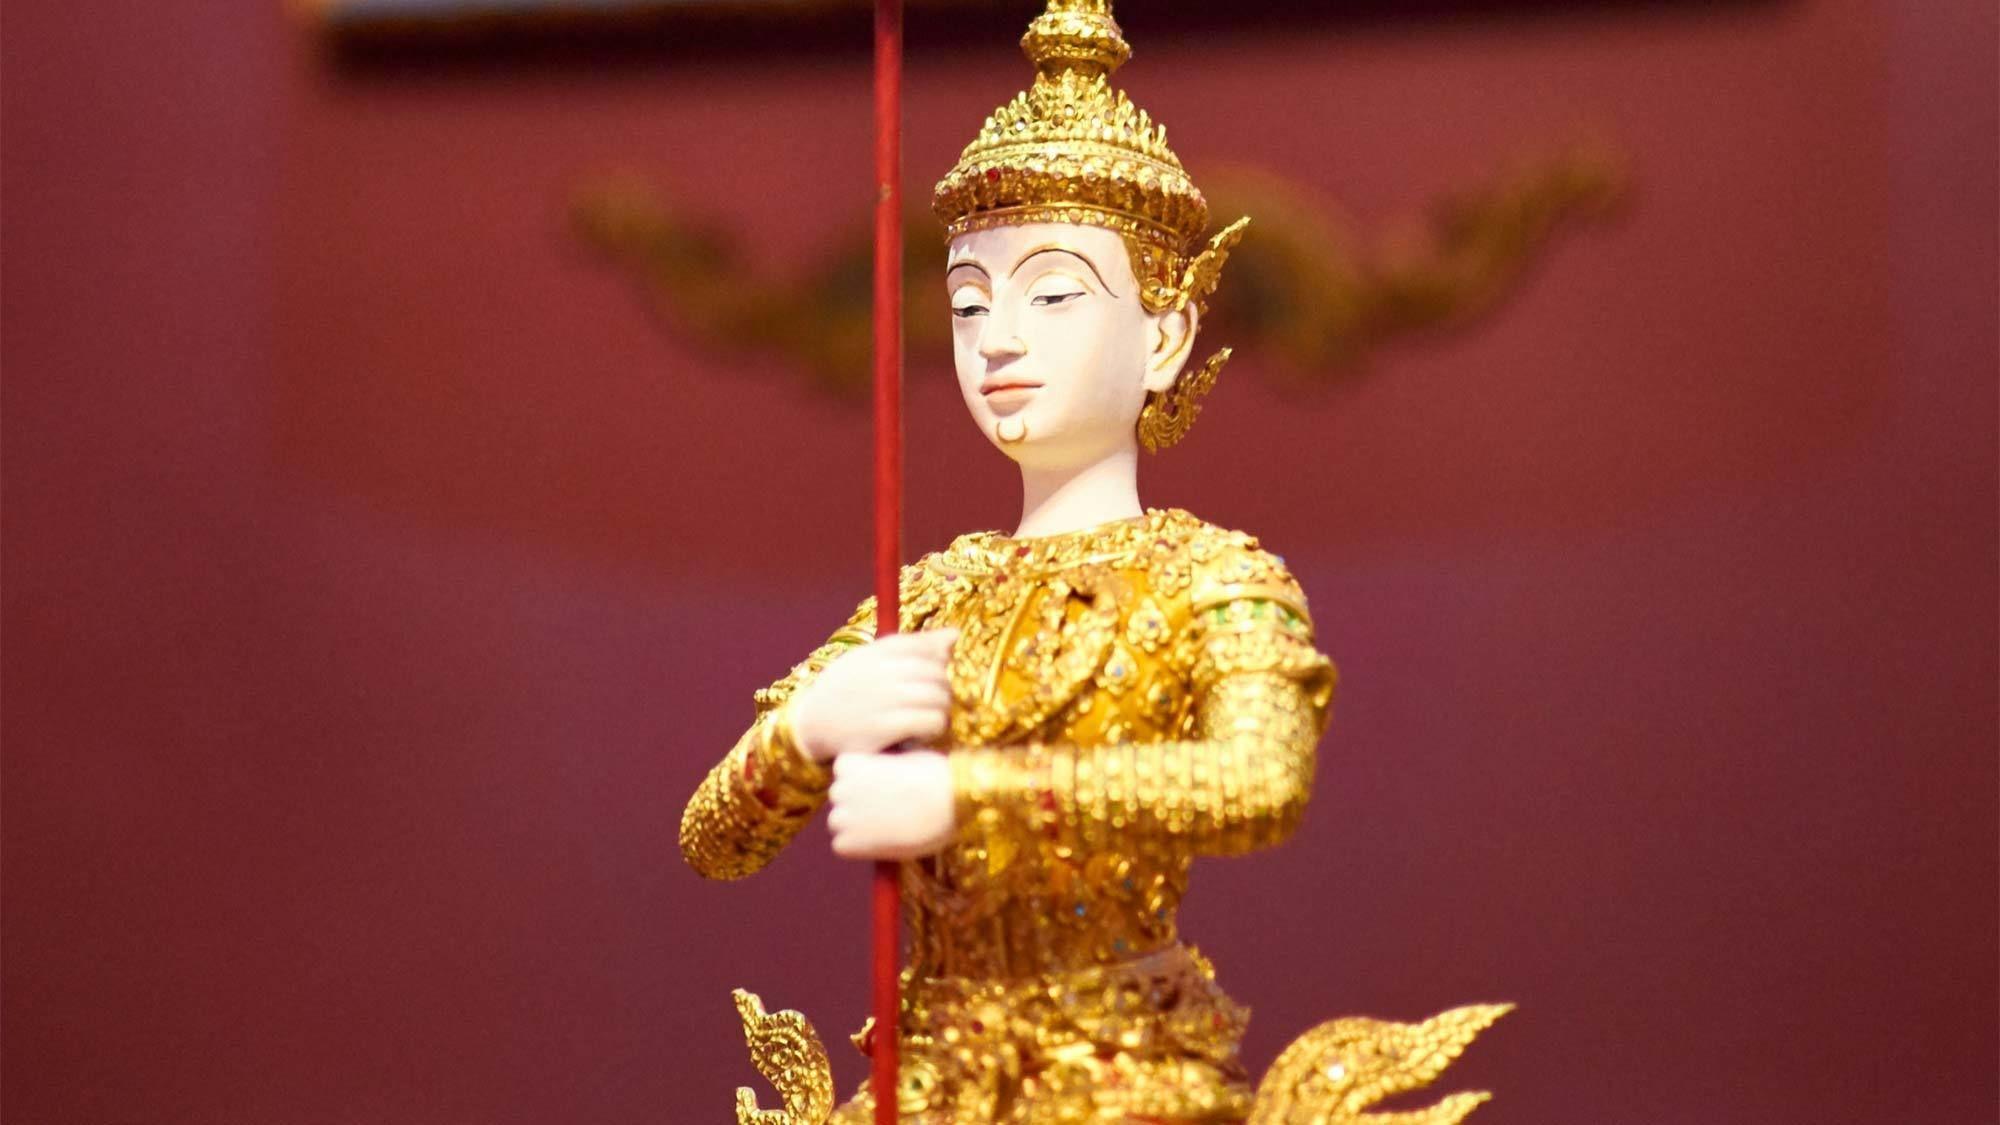 Statue at the Kamavijitra Museum in Bangkok, Thailand